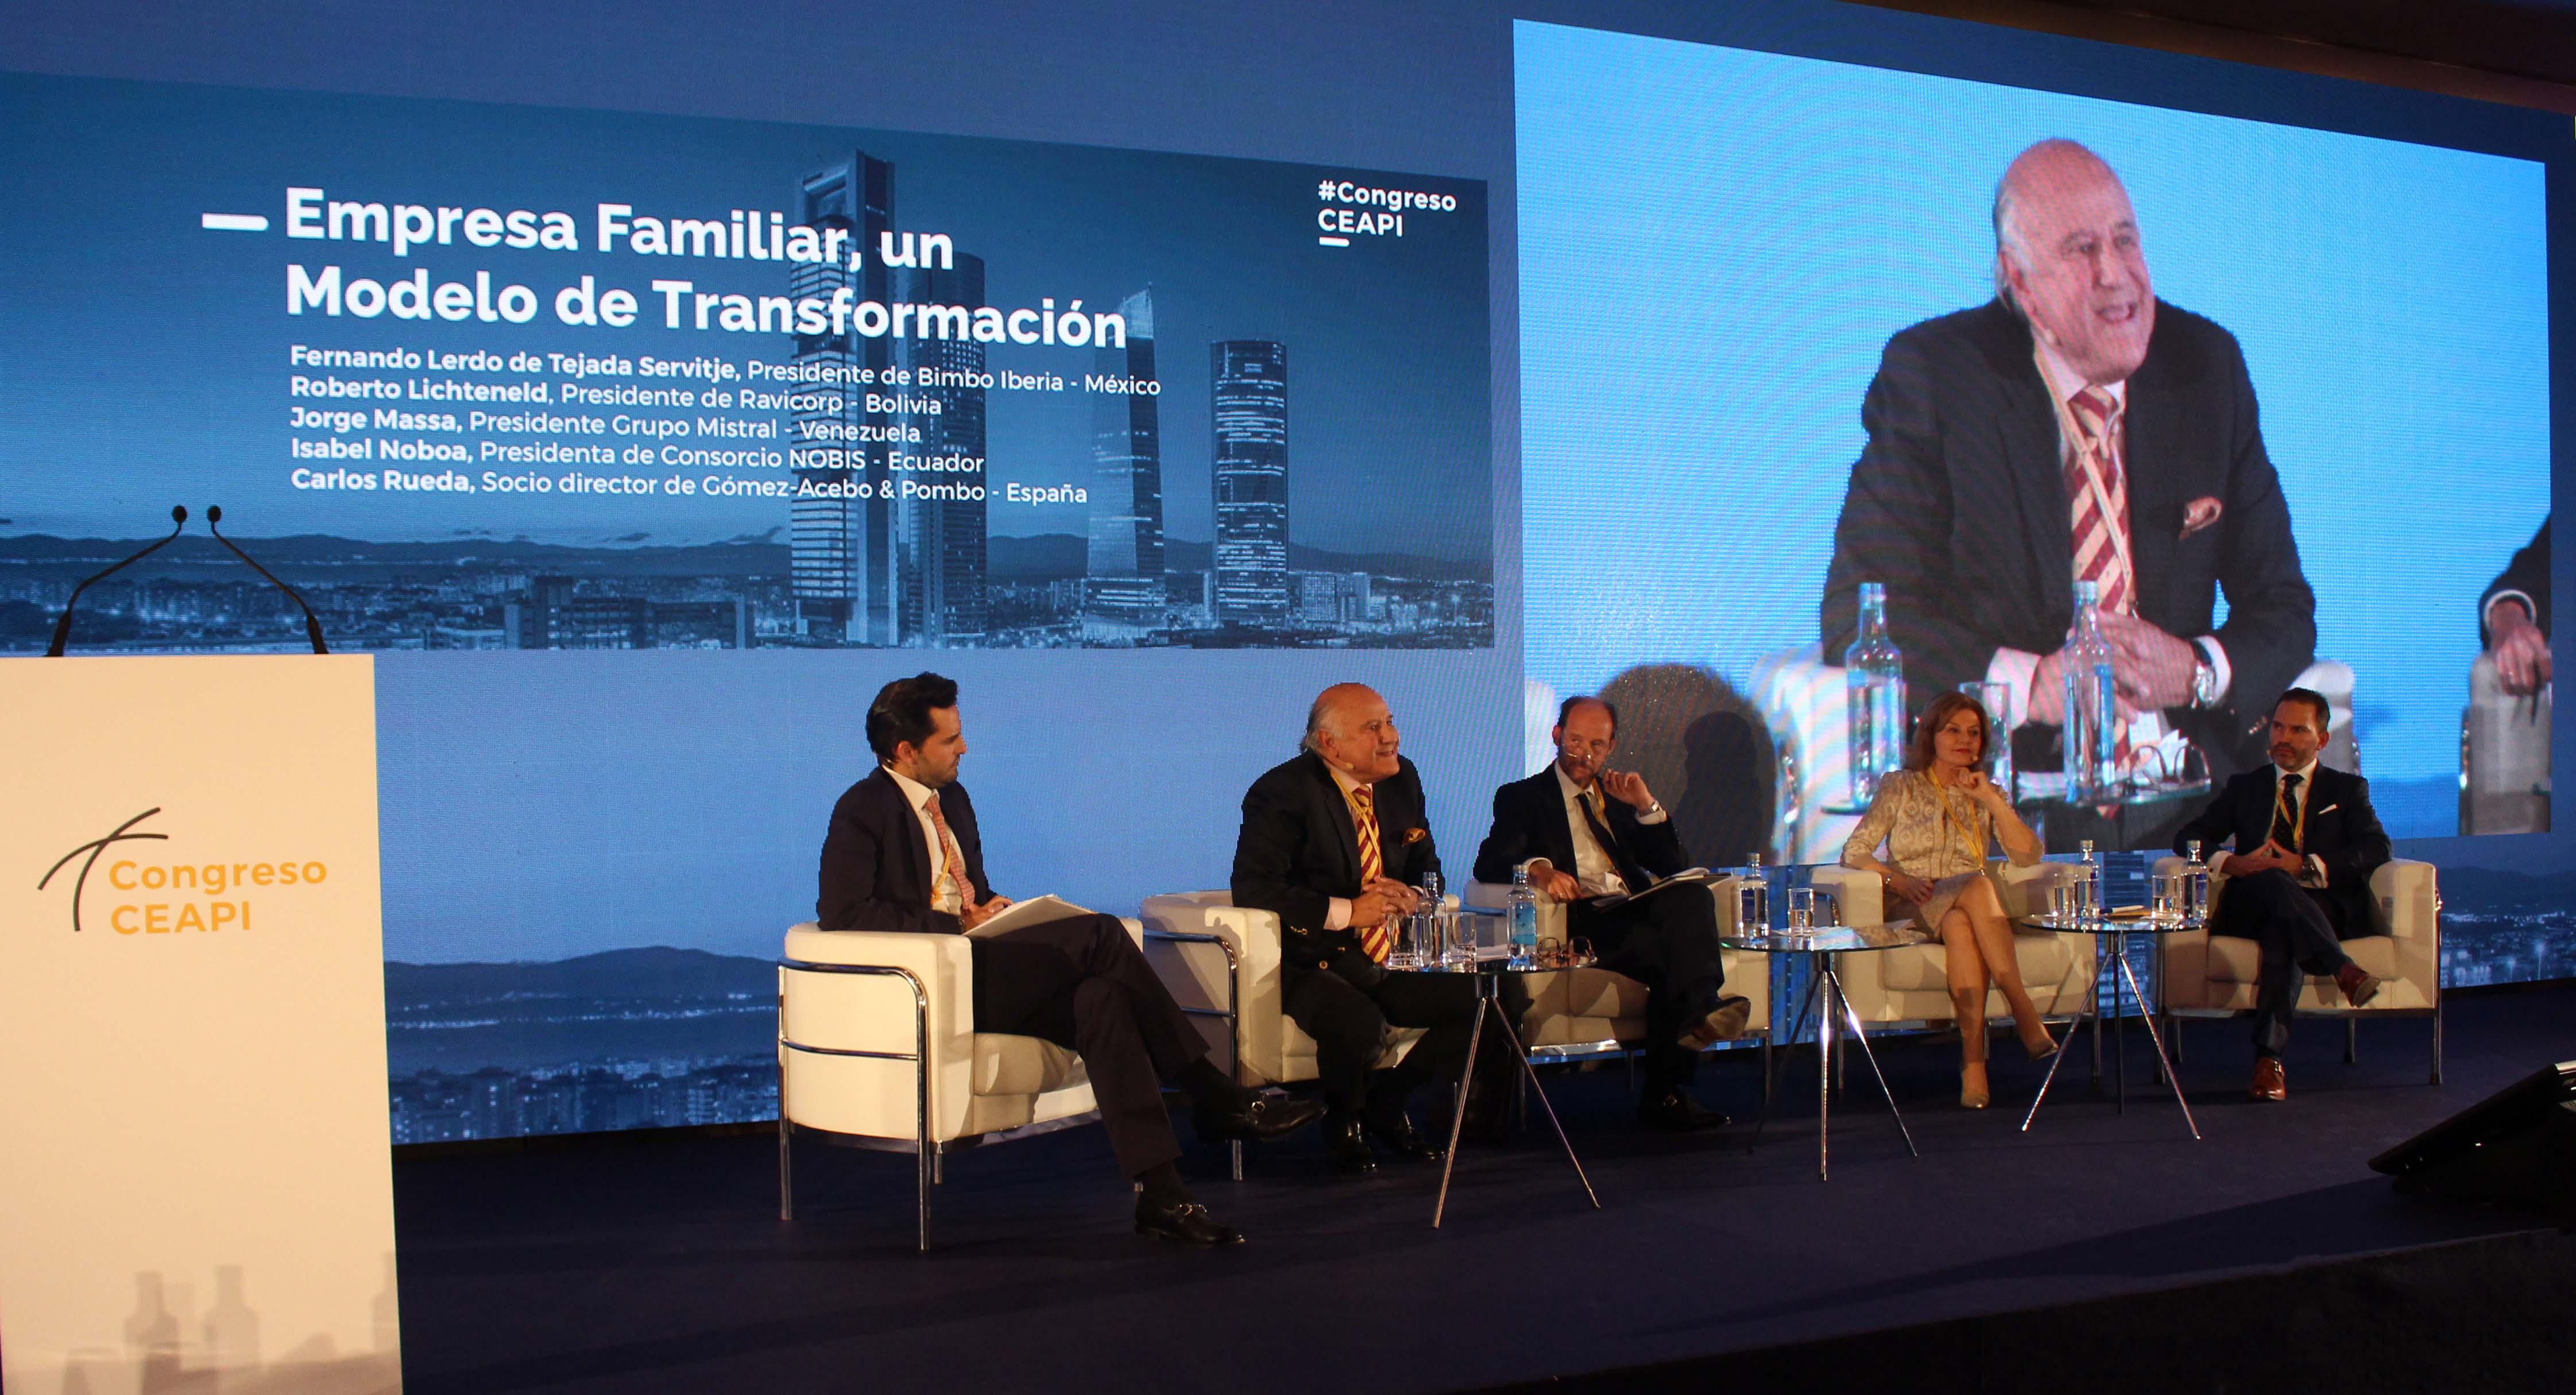 Los participantes escuchan la ponencia del venezolano Jorge Massa.